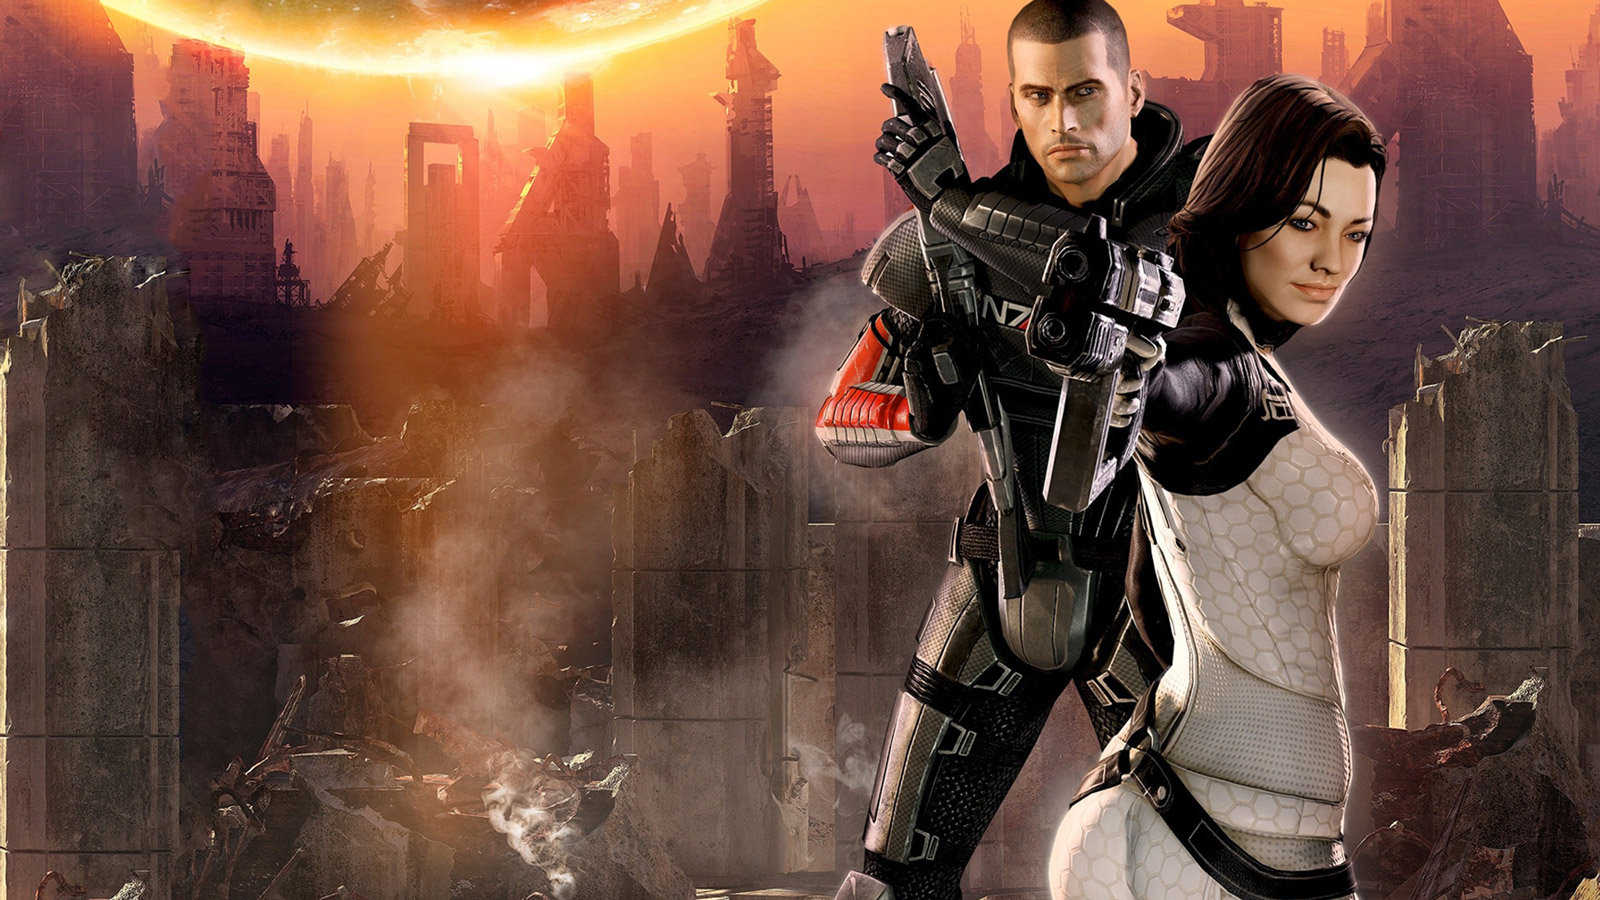 Free Mass Effect 2 Wallpaper in 1600x900